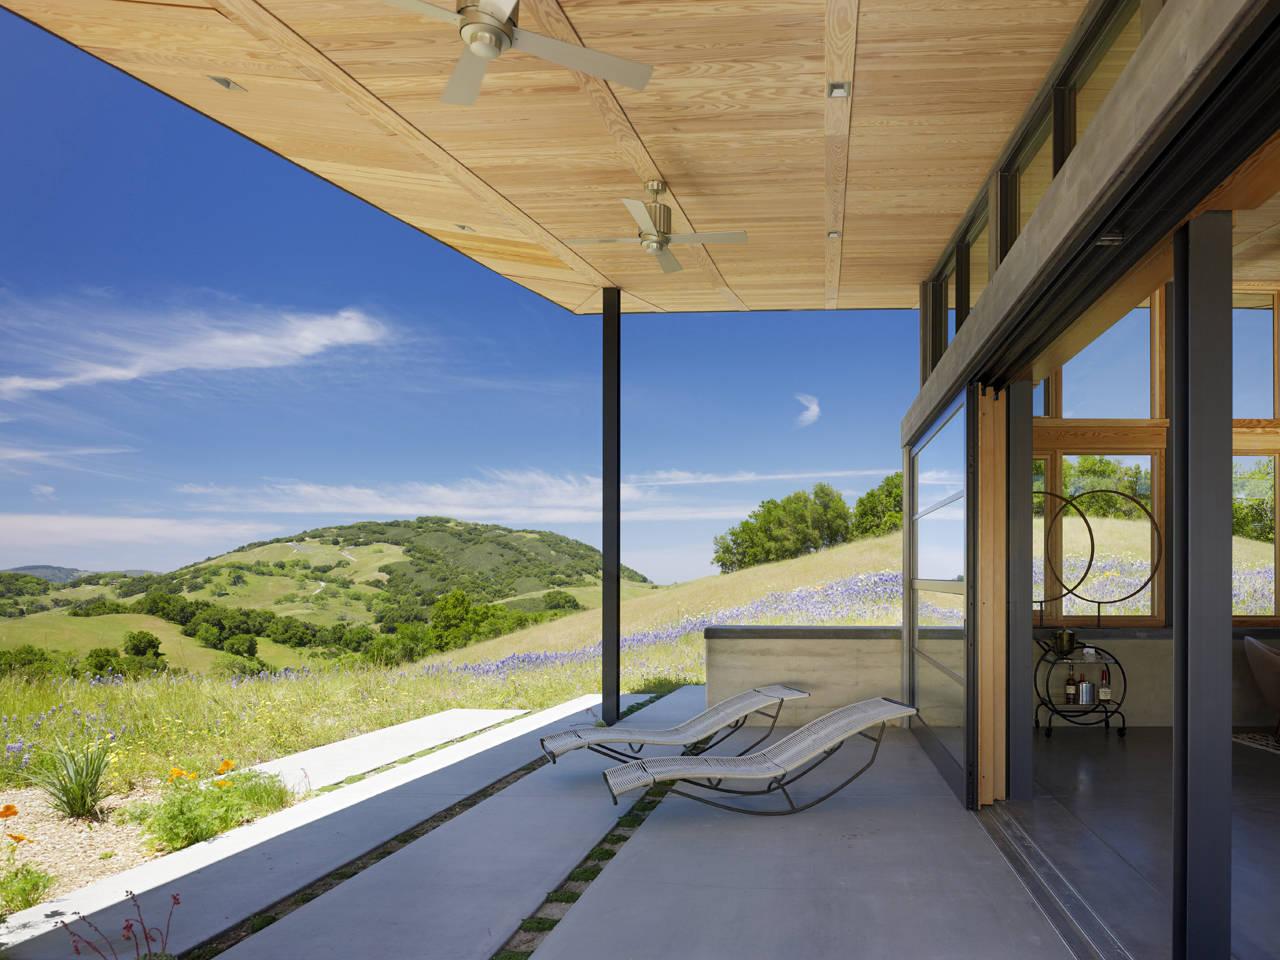 Terrace, Hill Views, Caterpillar House in Carmel, California by Feldman Architecture